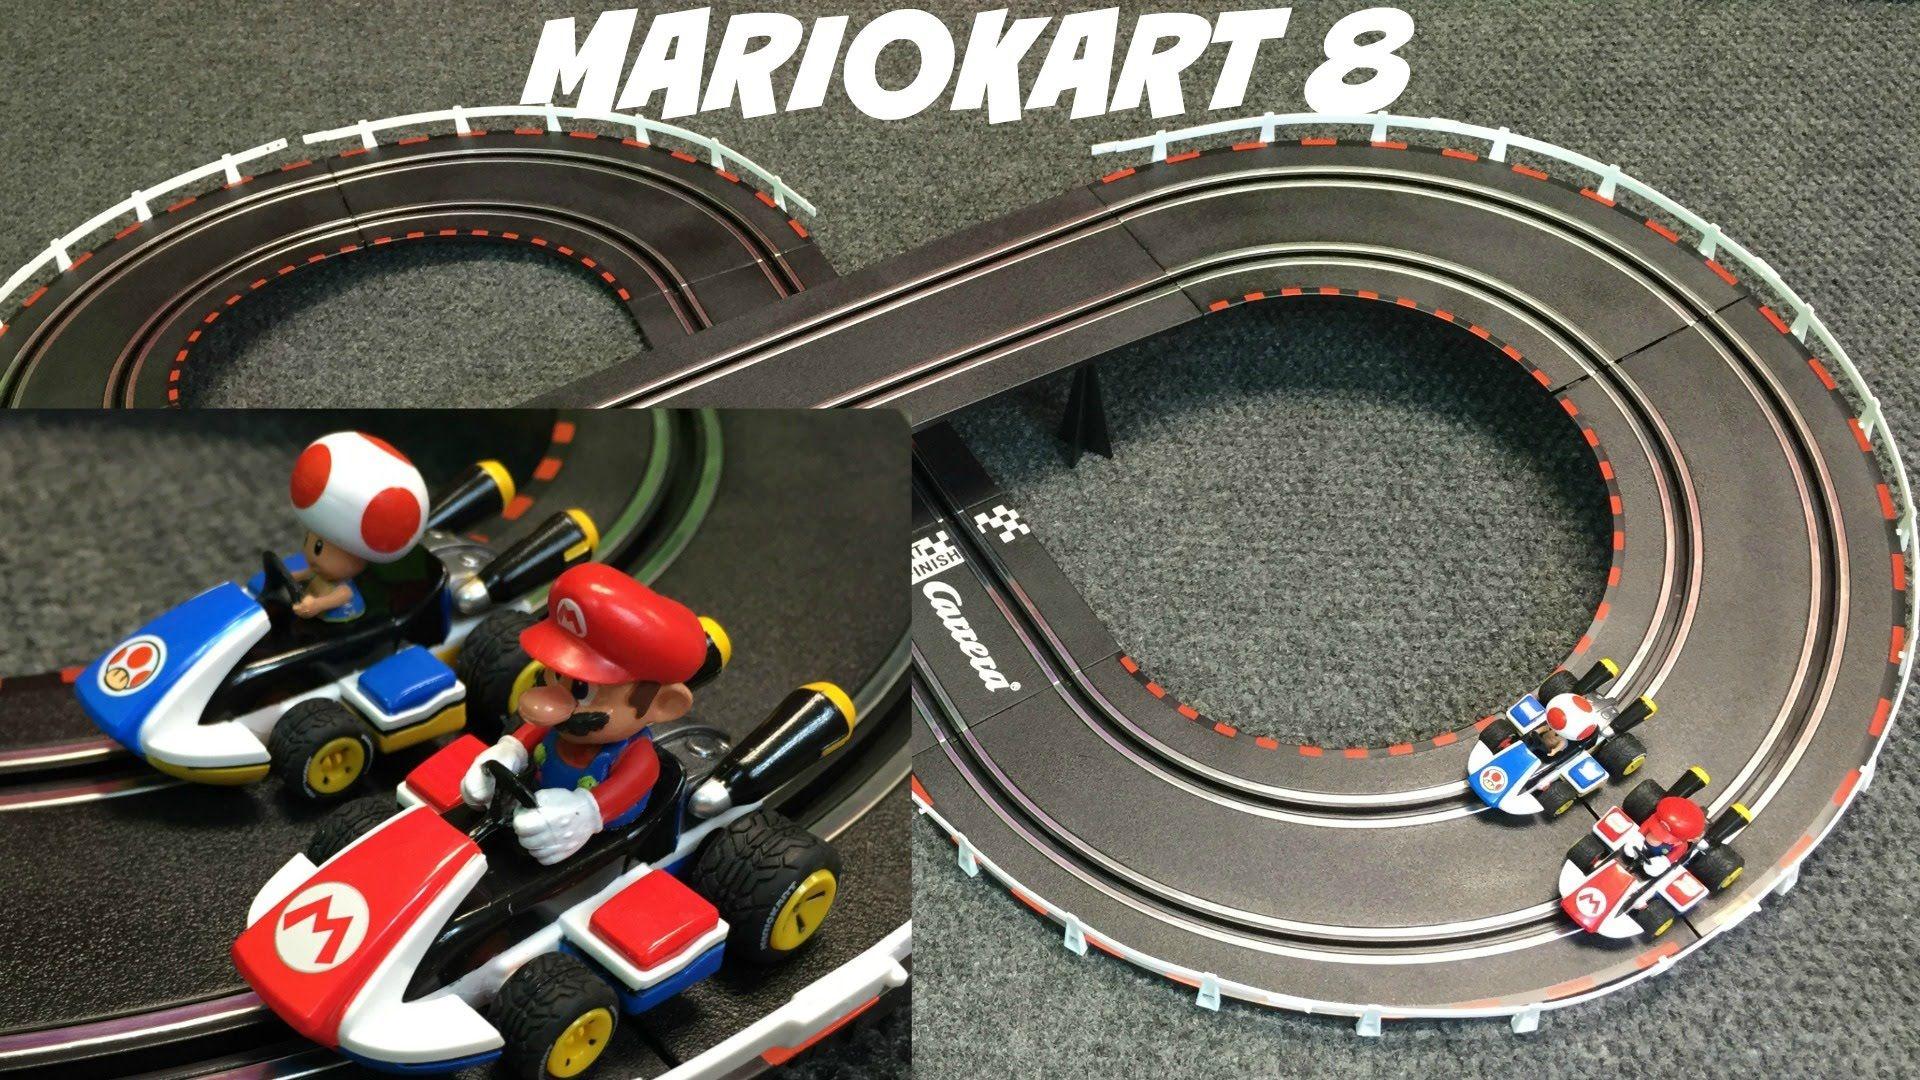 Carrera Mario Kart 8 Infinity Slot Car Racing Set Nintendo Slot Car Racing Sets Slot Car Racing Slot Cars